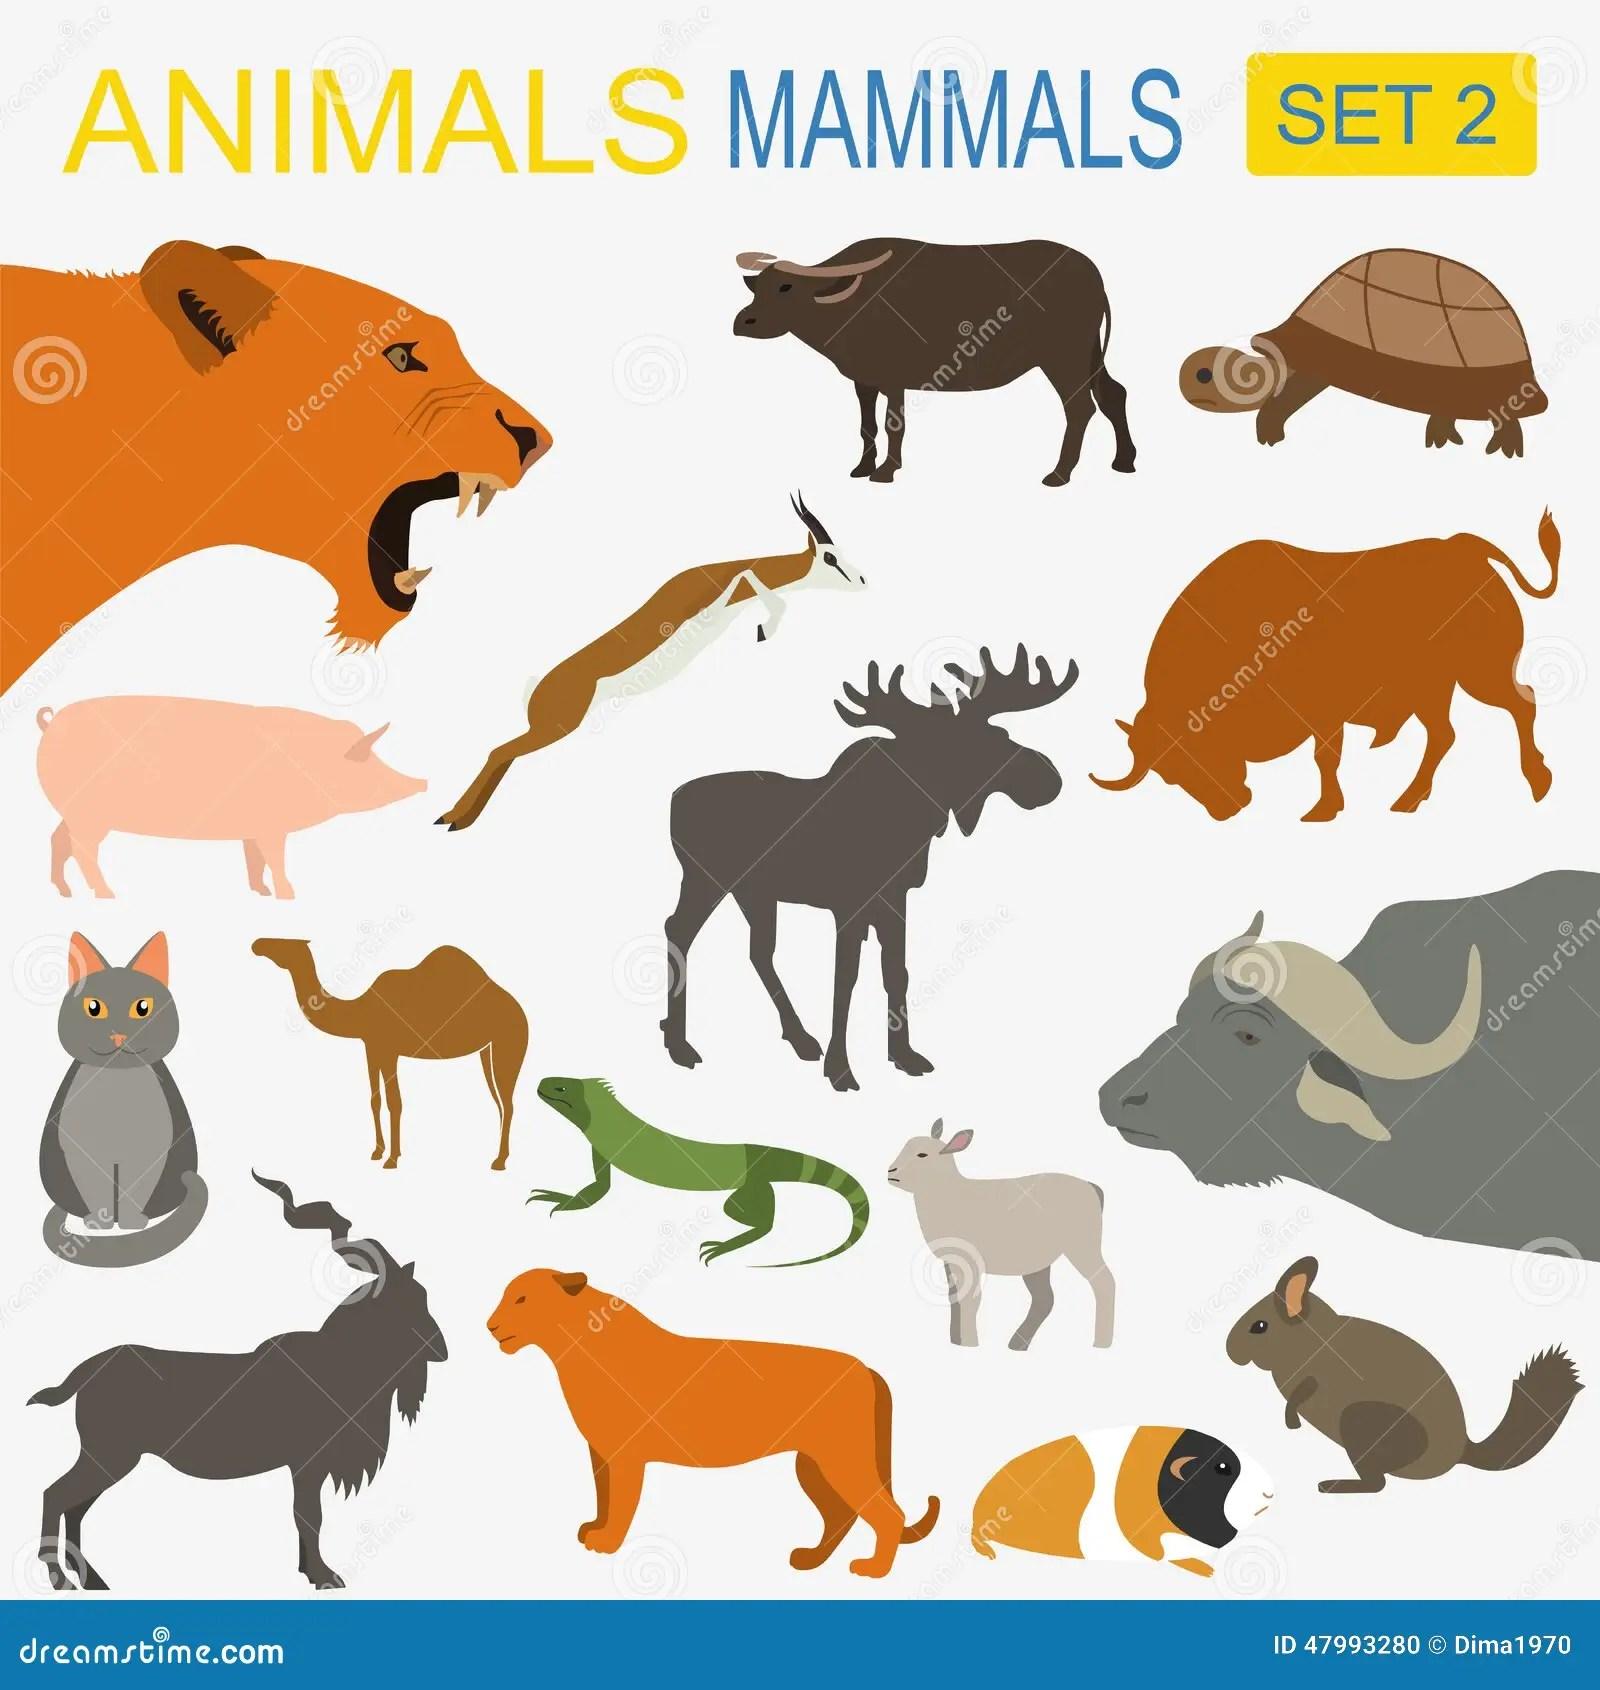 Animals Mammals Icon Set Vector Flat Style Stock